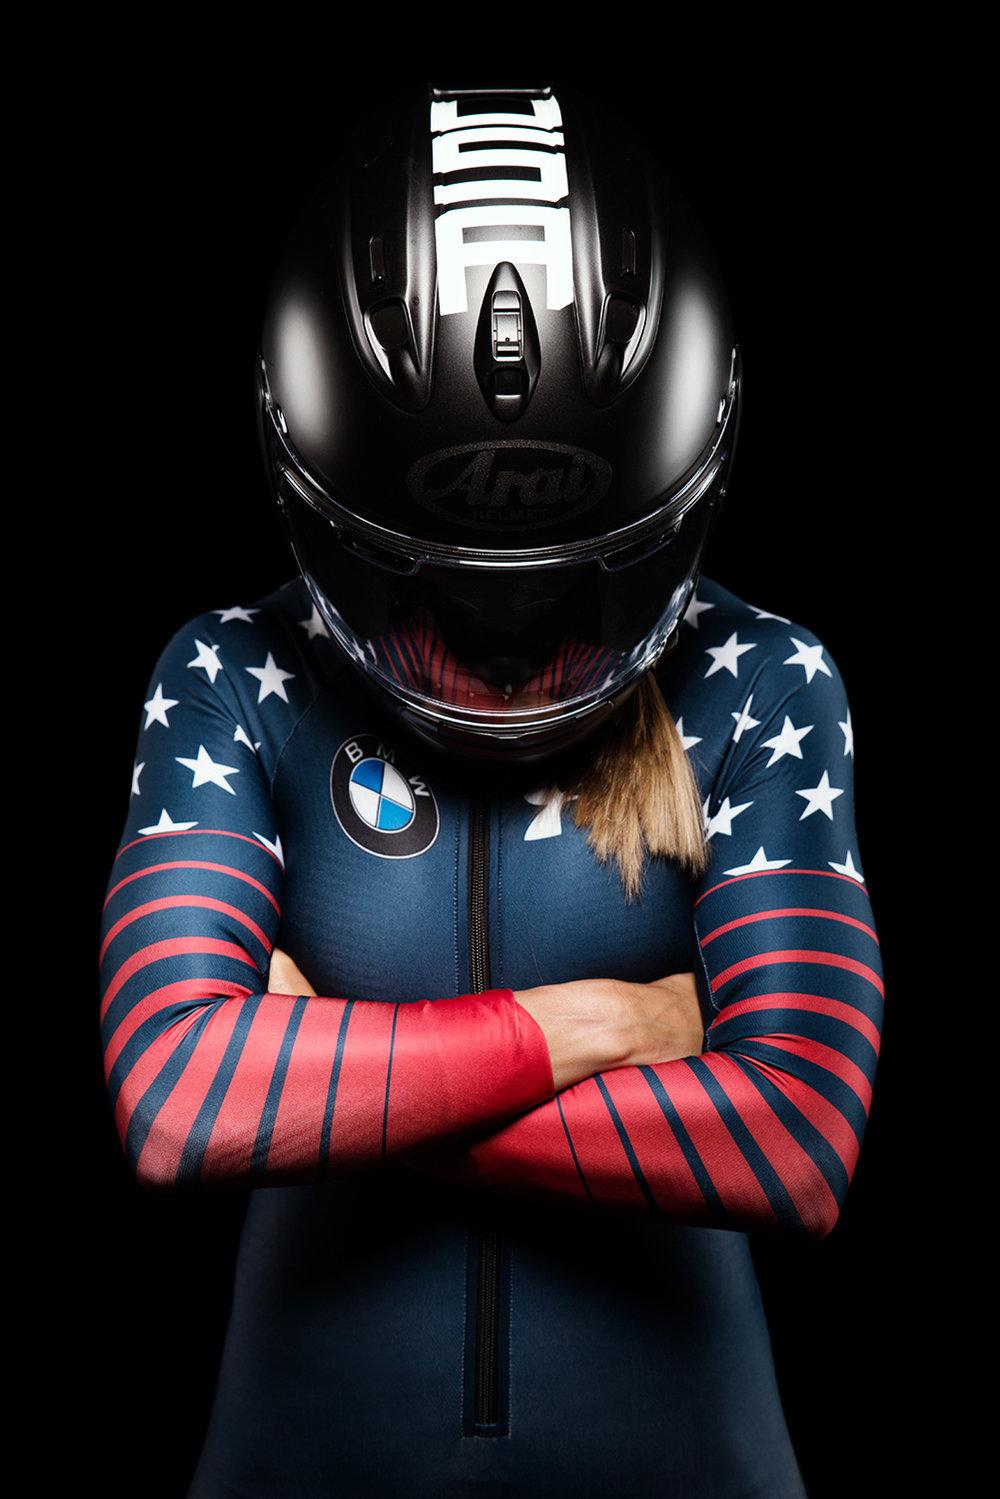 Brittany_Reinbolt_Helmet_2-WEB.jpg